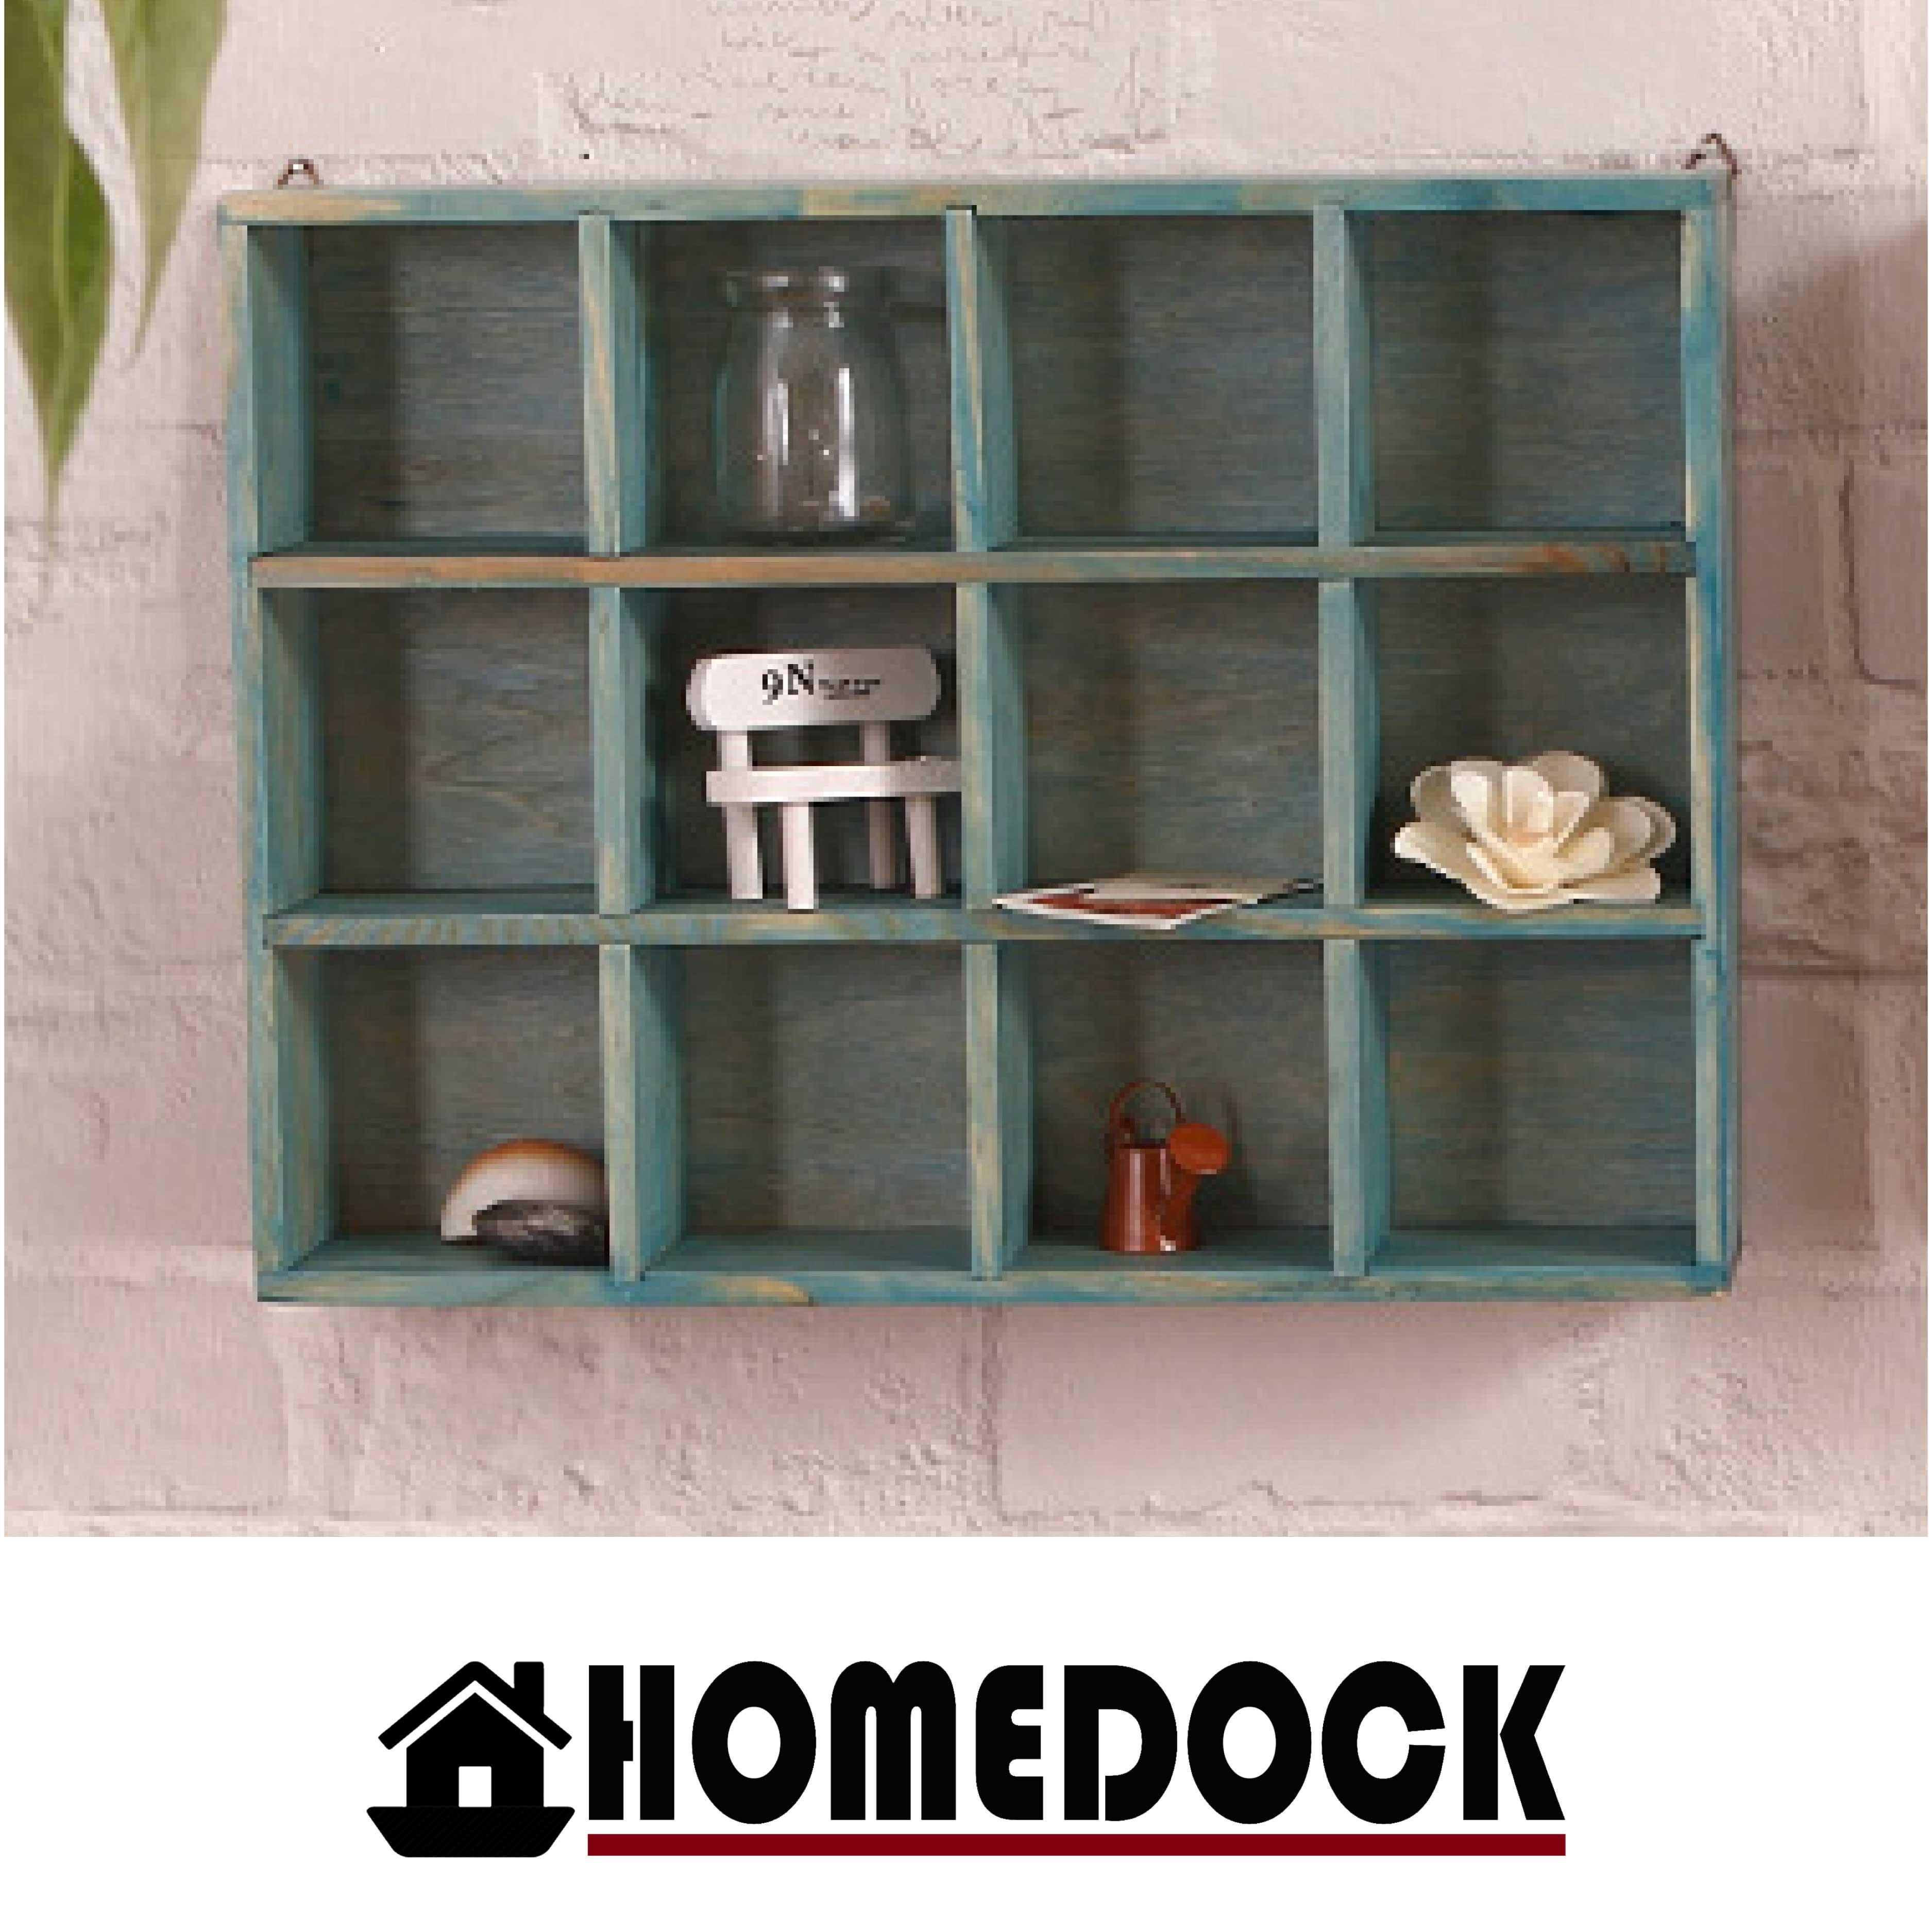 HOMEDOCK-原木質感12格牆面收納櫃 /壁櫃/展示櫃/杯架/收納盒/原木/掛壁